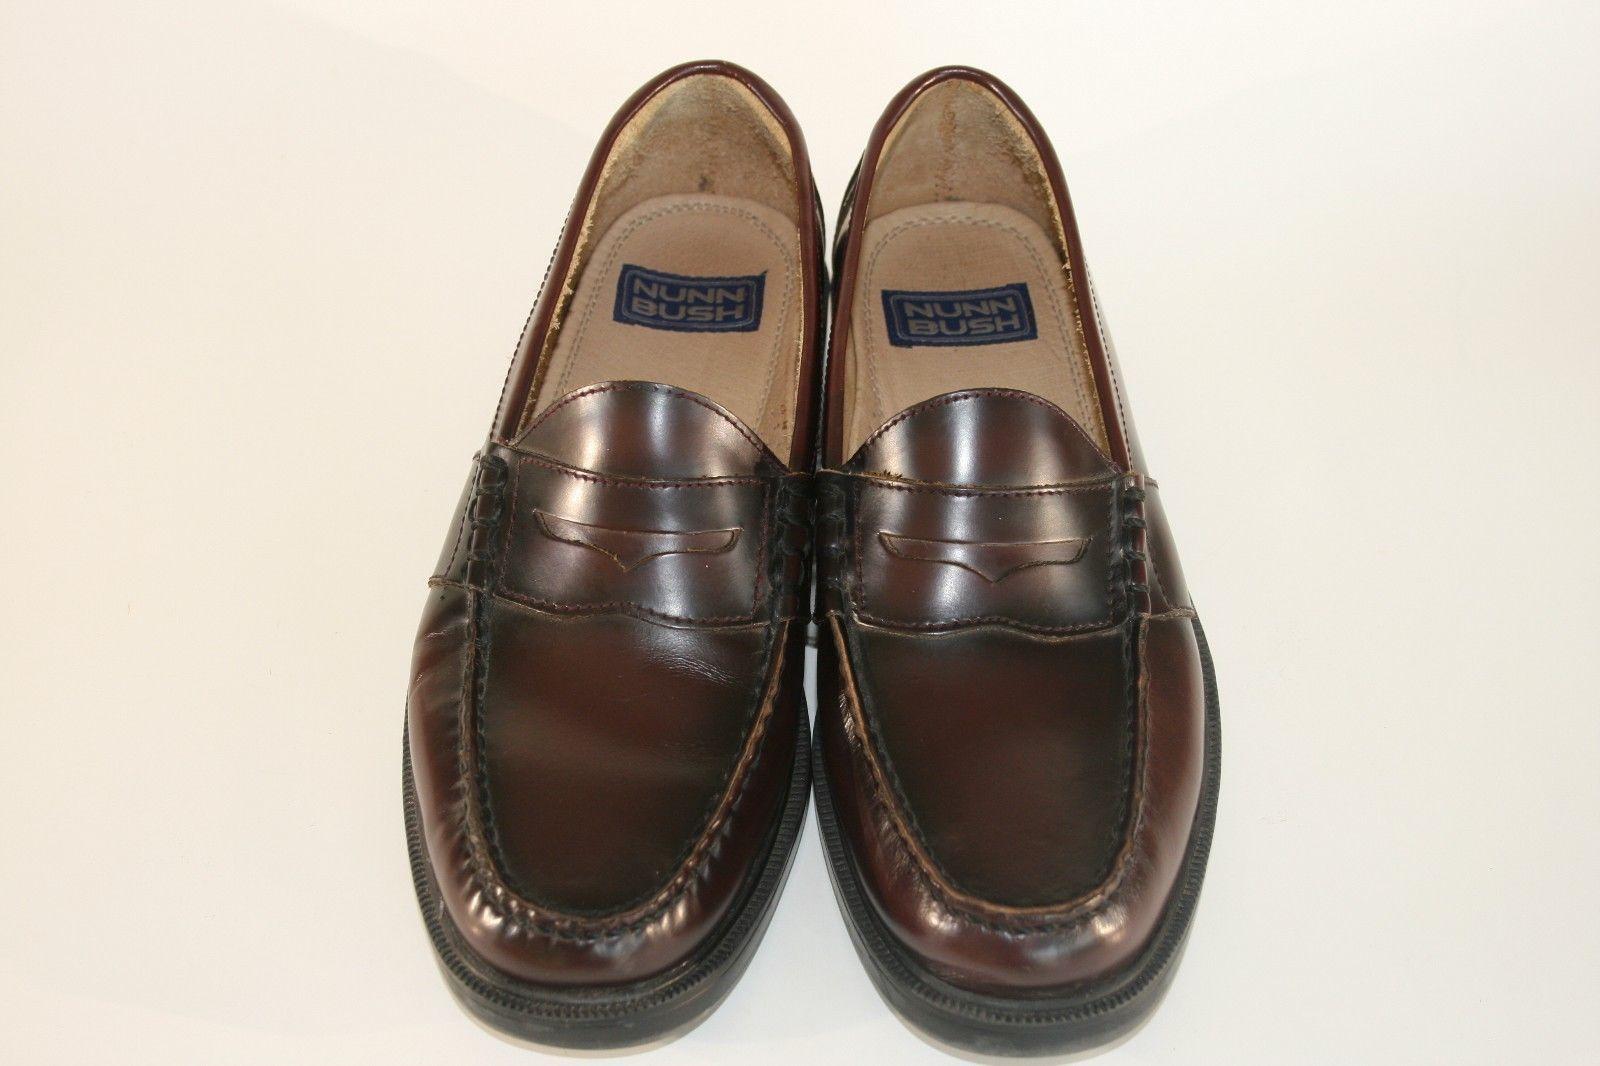 bdfe1643bb3 Nunn Bush Lincoln Mens Burgundy Leather and similar items. 57